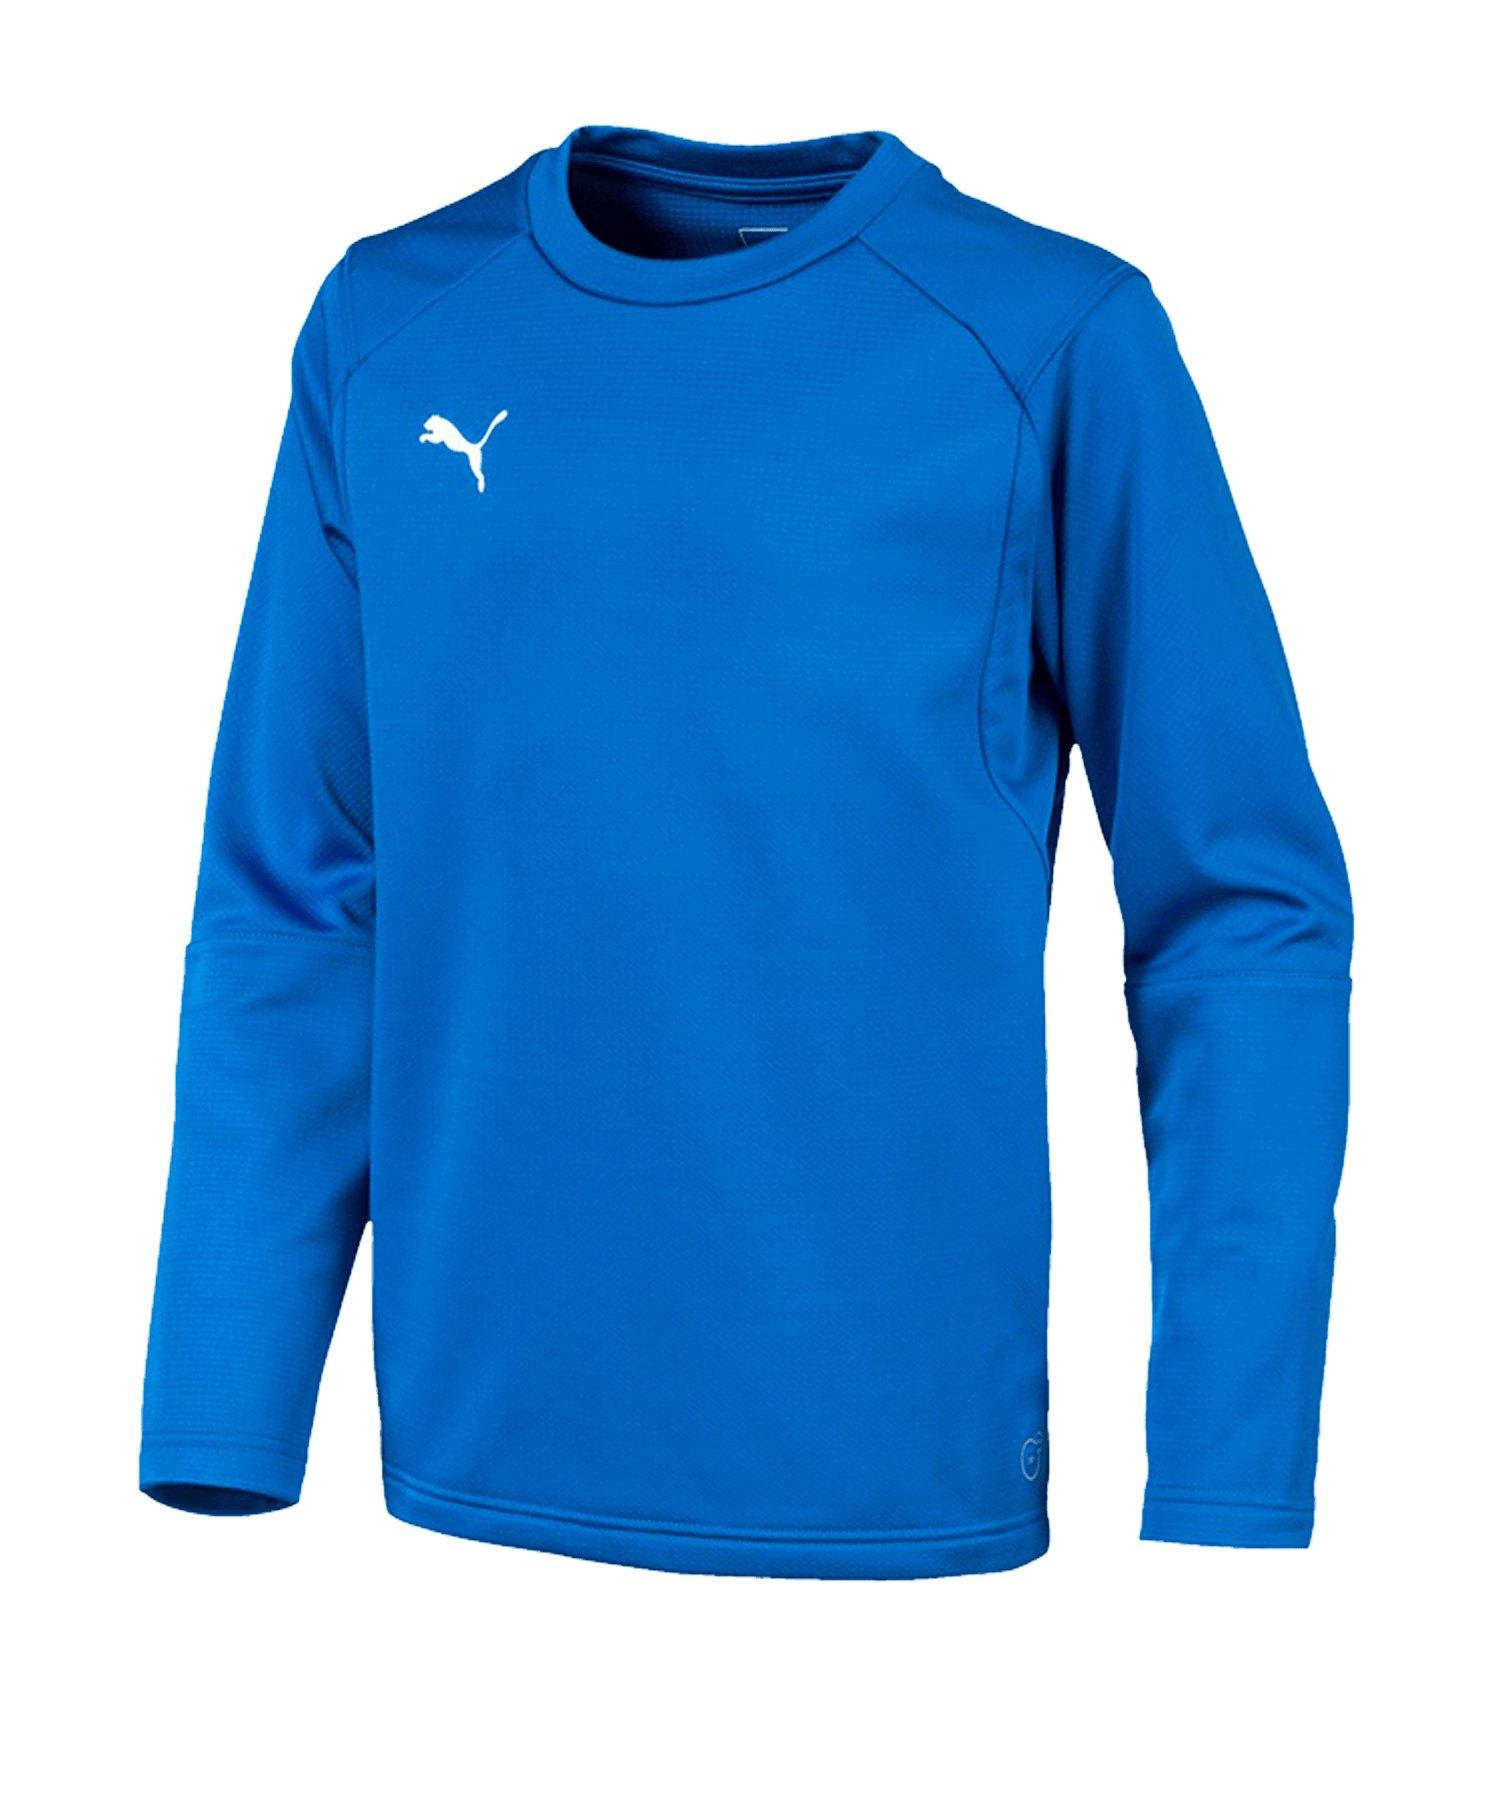 PUMA LIGA Training Sweatshirt Kids Blau F02 - blau